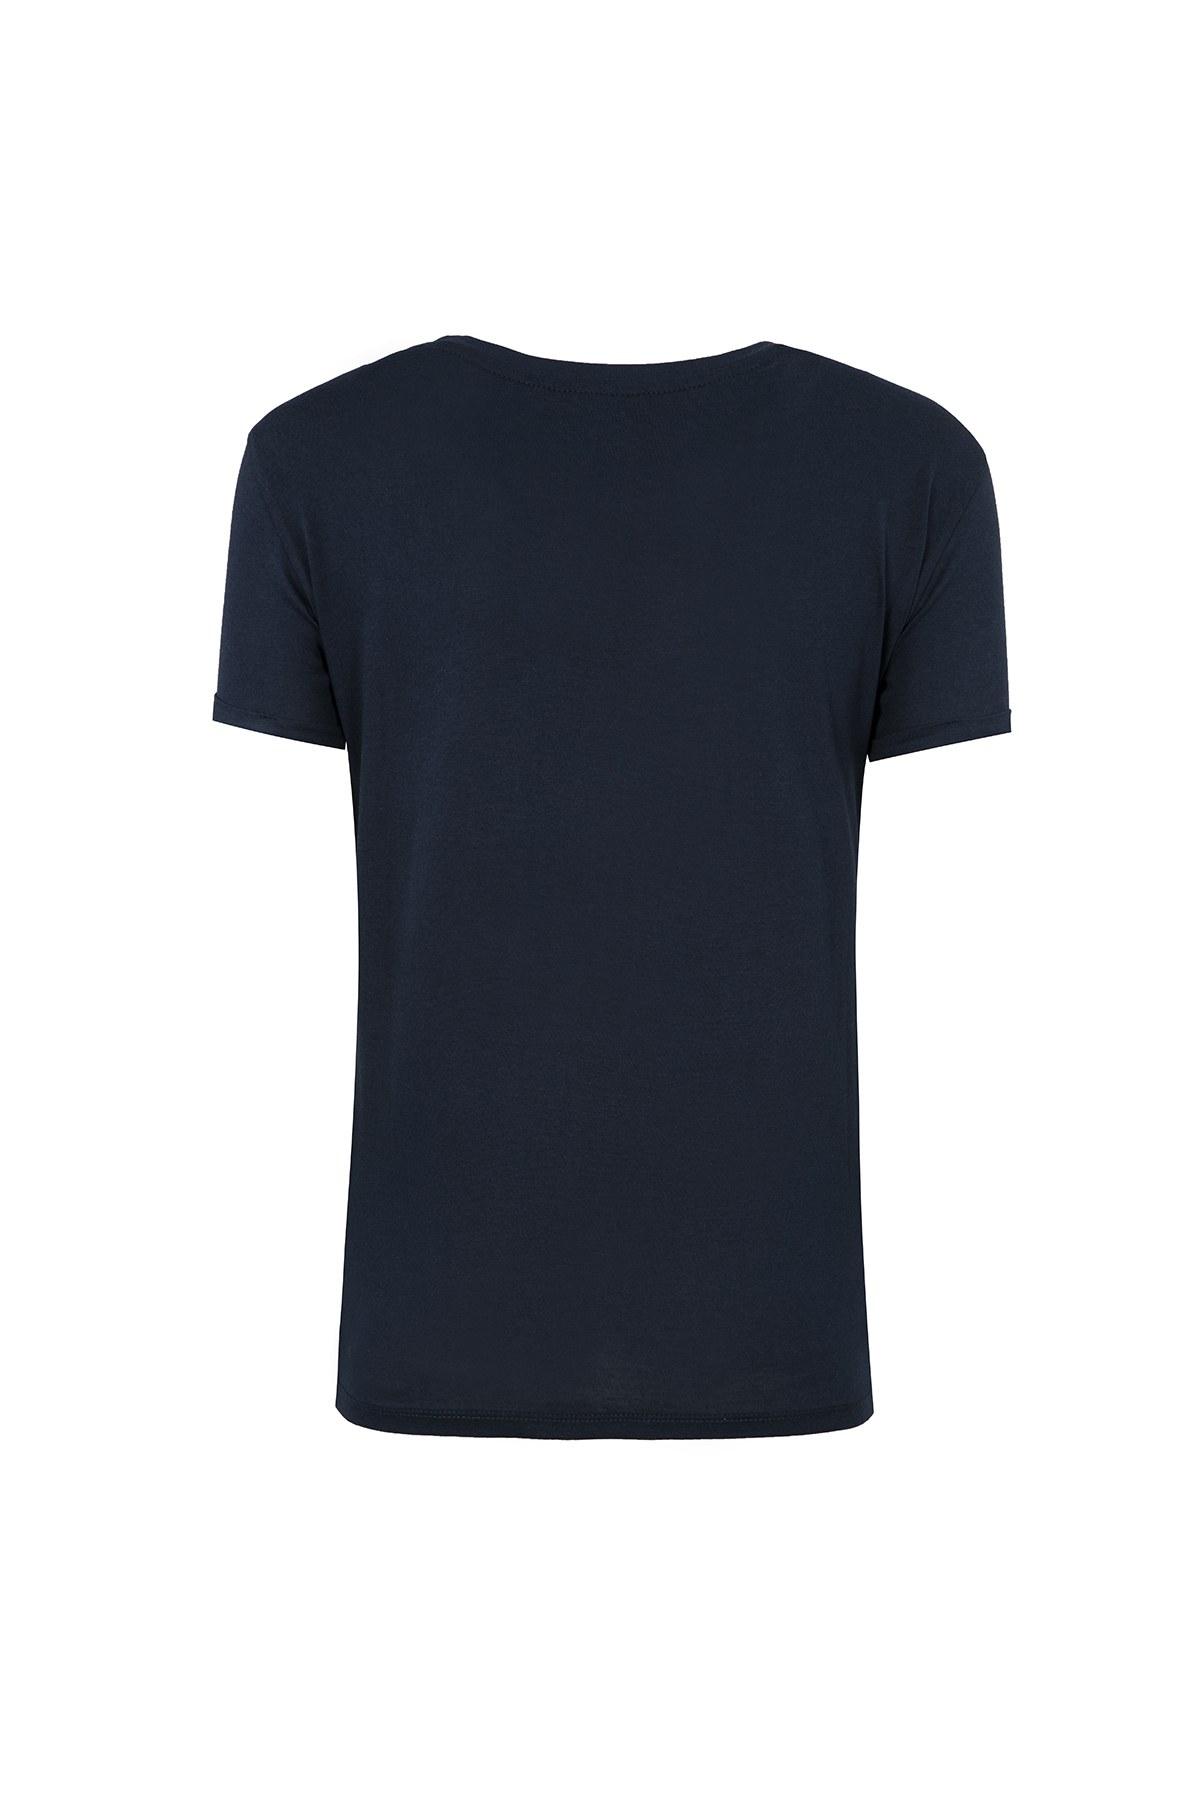 ARMANI EXCHANGE T SHIRT Kadın T Shirt 6ZYTAH YJW3Z 1510 LACİVERT